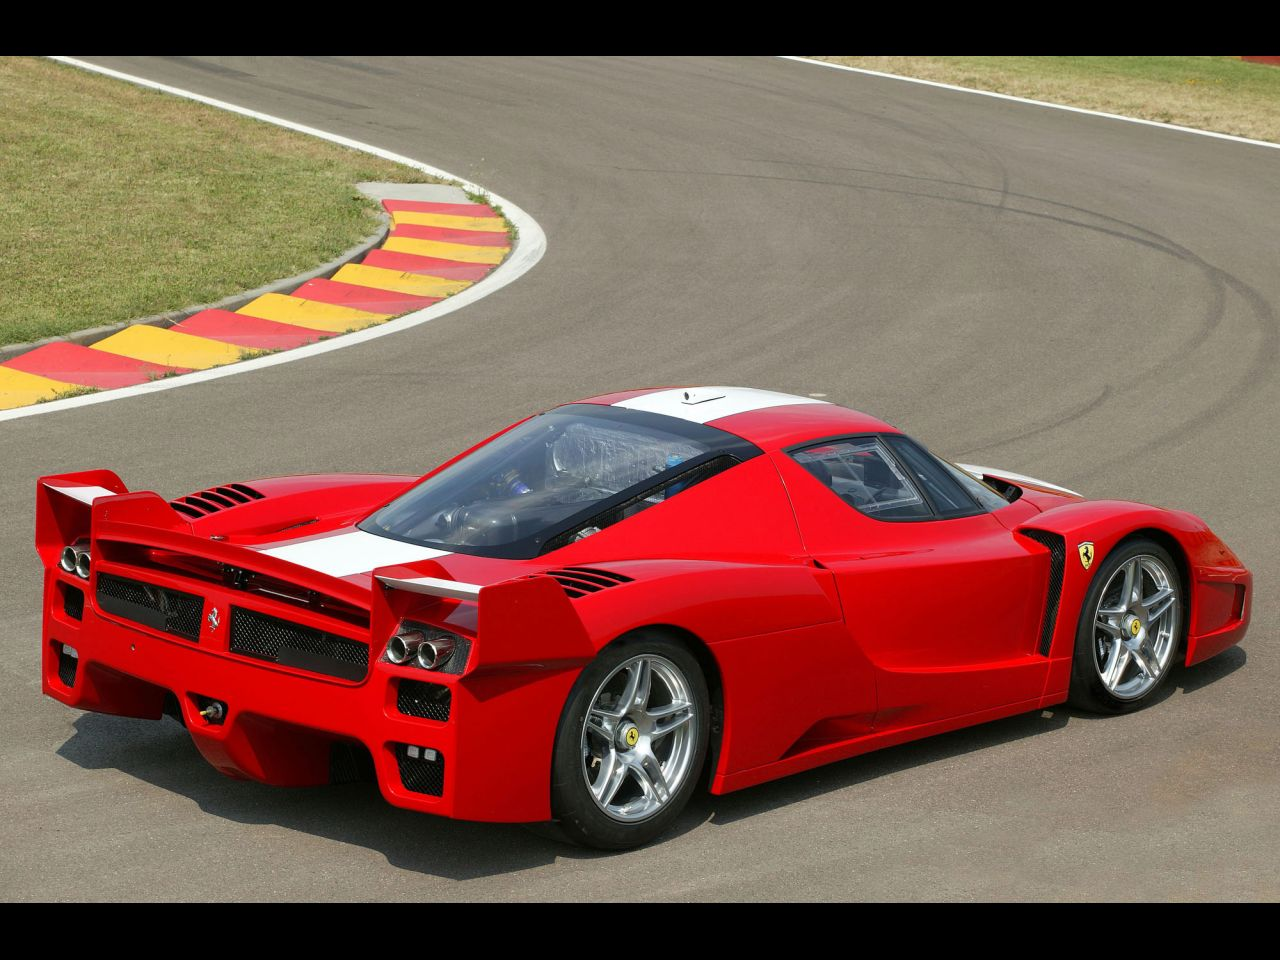 2005 Ferrari FXX Picture